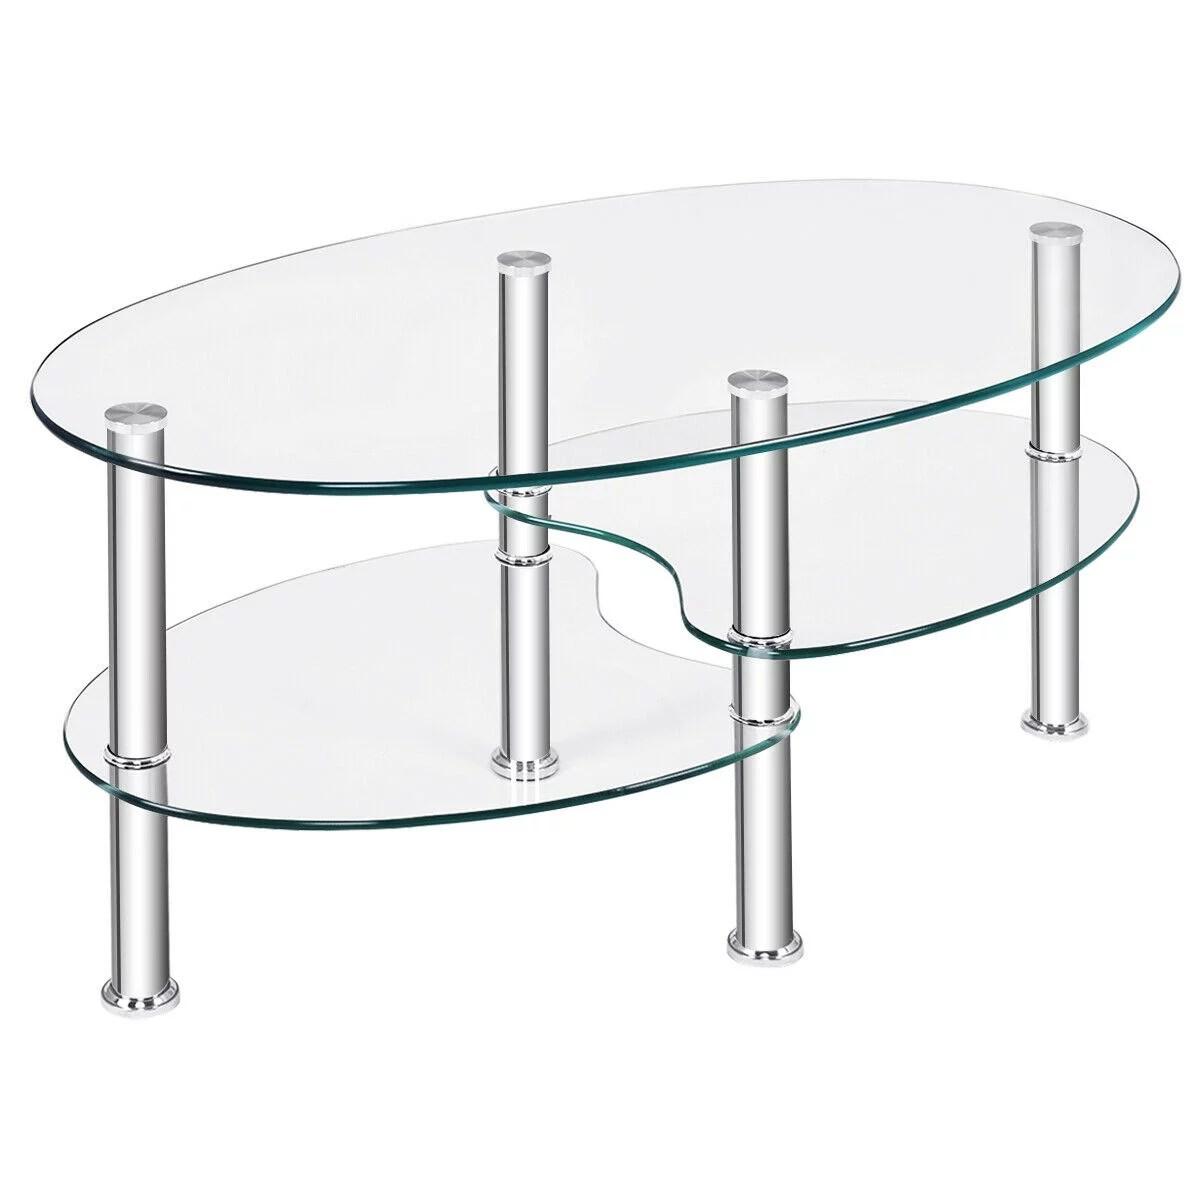 tempered glass oval side coffee table shelf chrome base living room clear